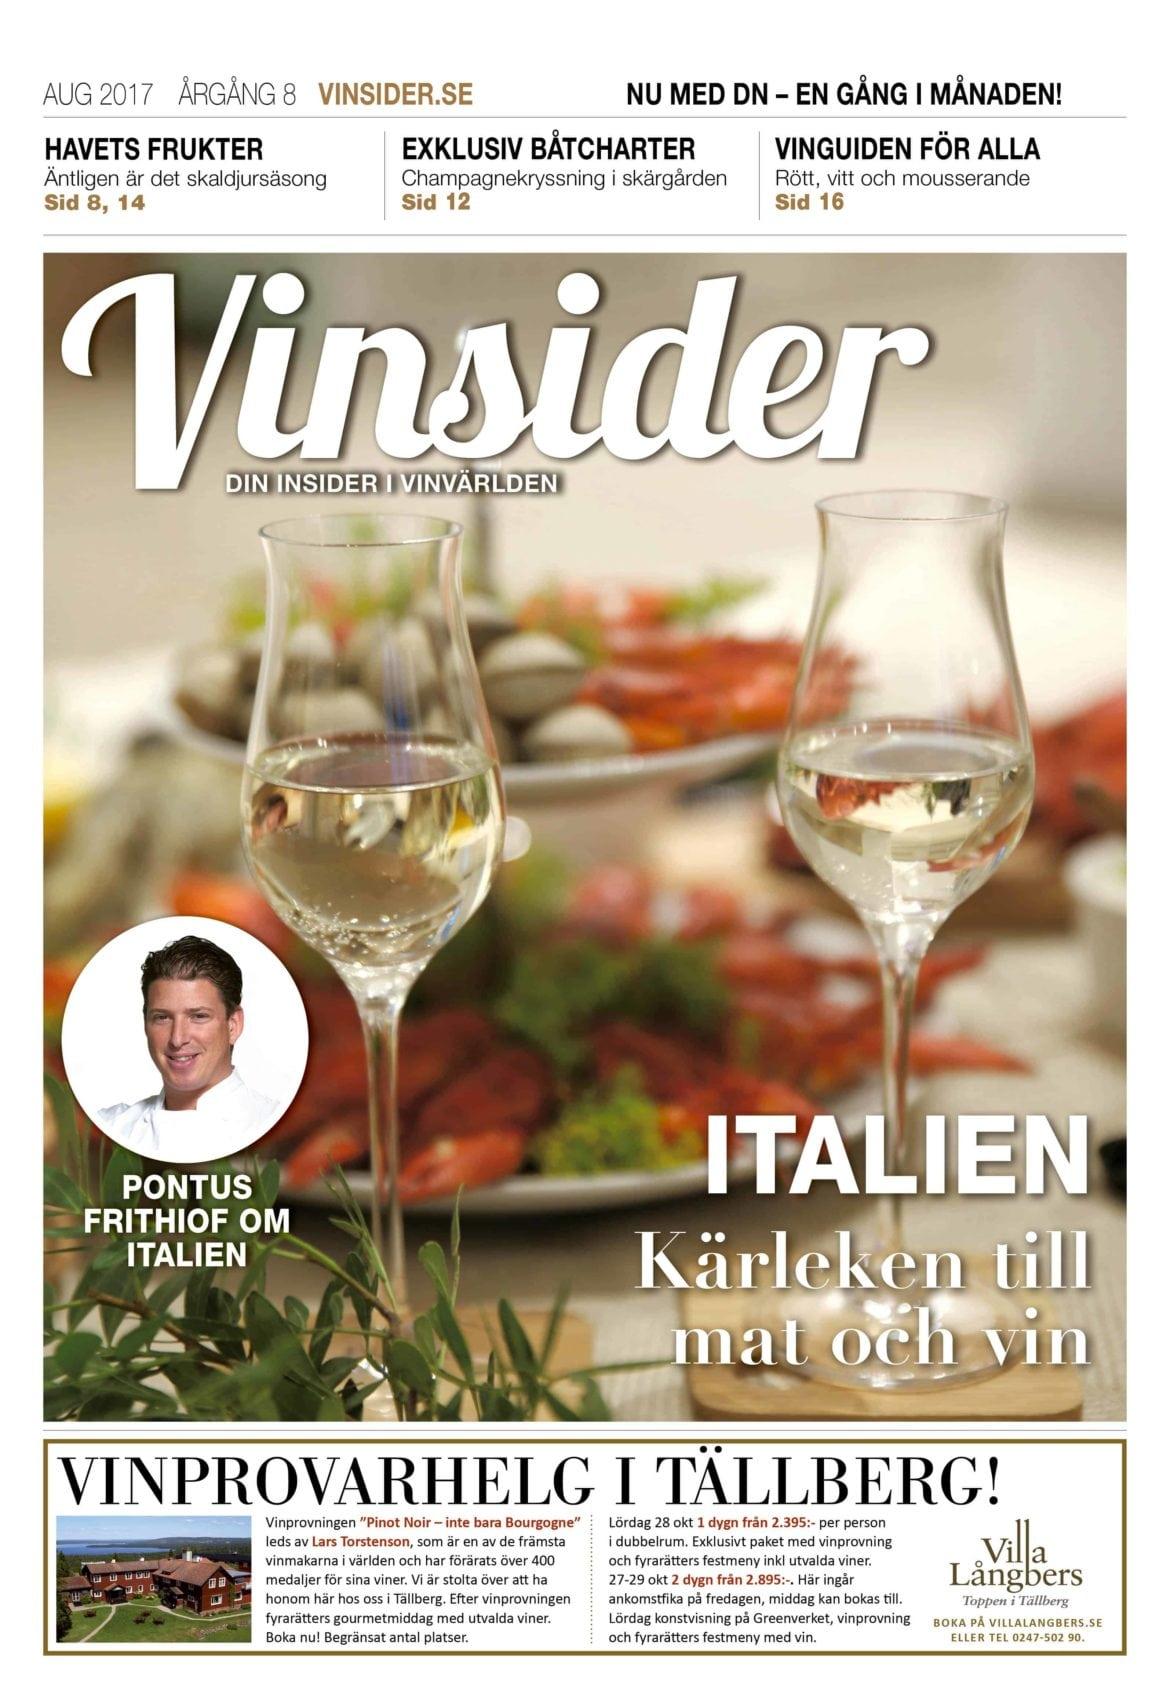 Vinsider 6 2017